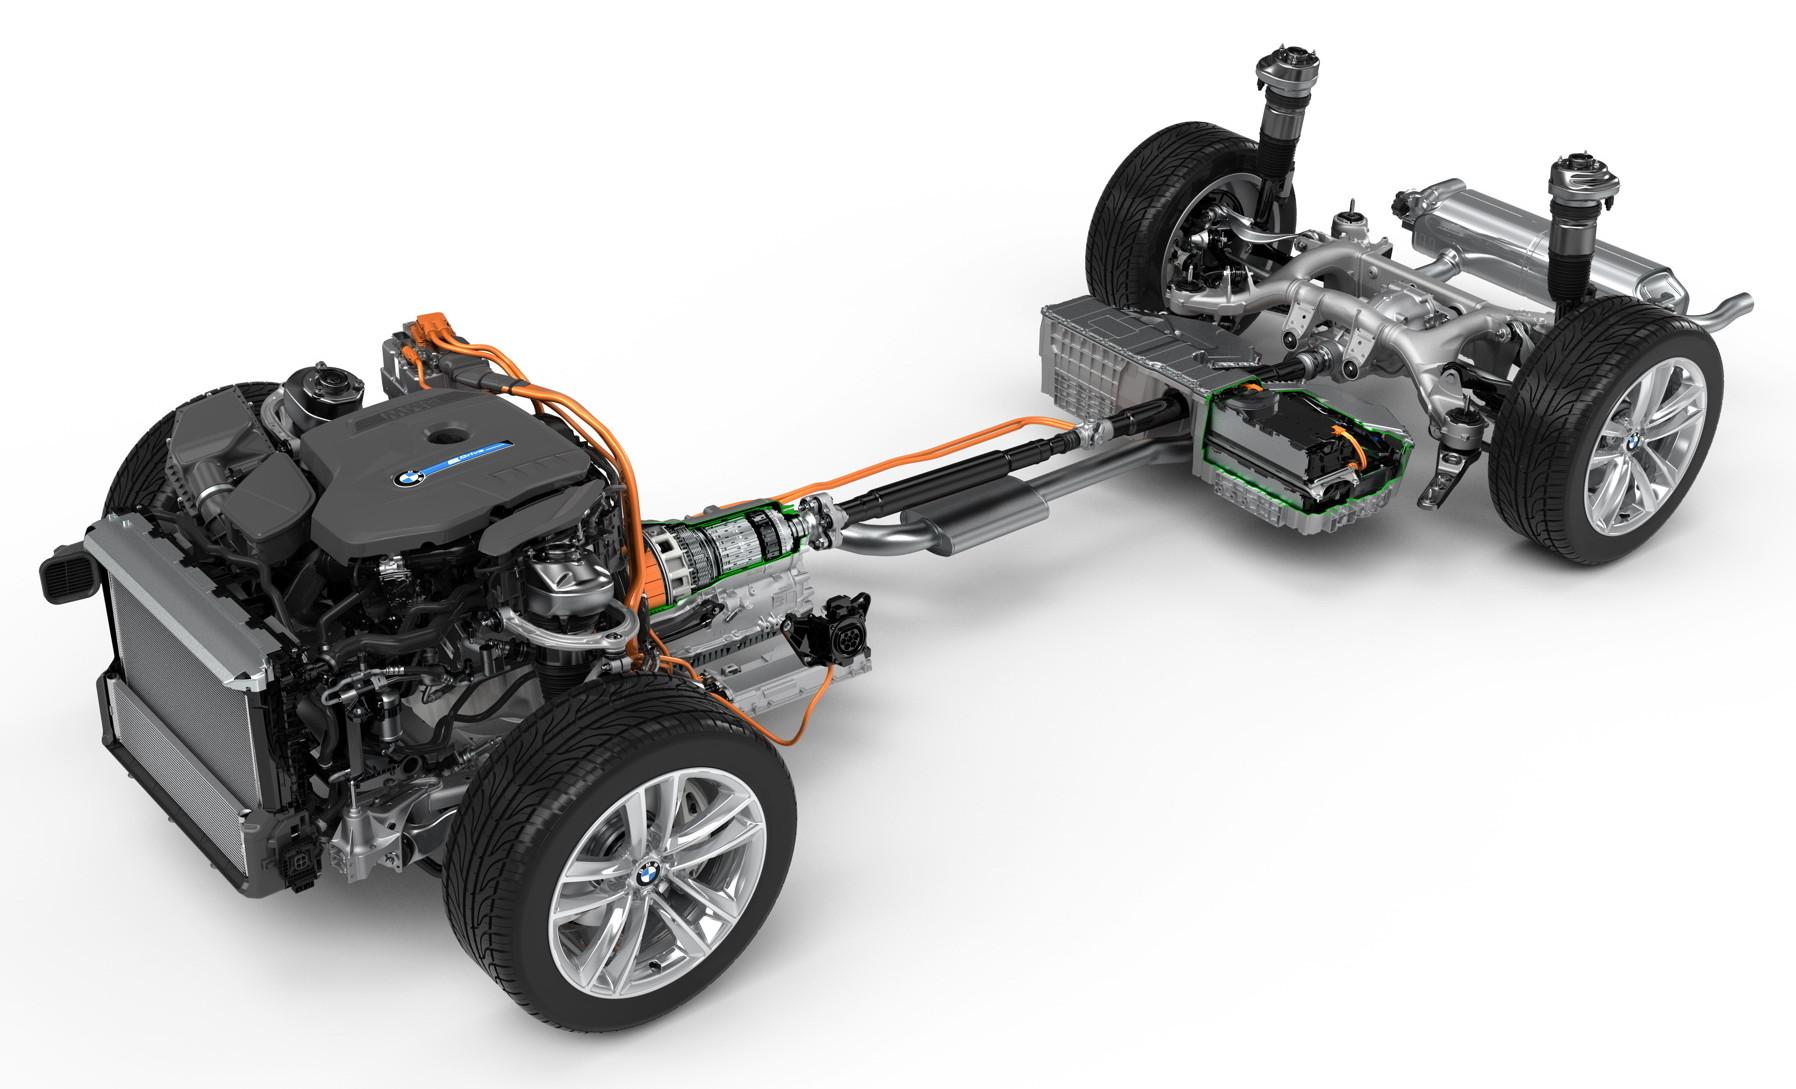 BMW 740e iPerformance plug-in hybrid electric vehicle (PHEV) powertrain and drivetrain